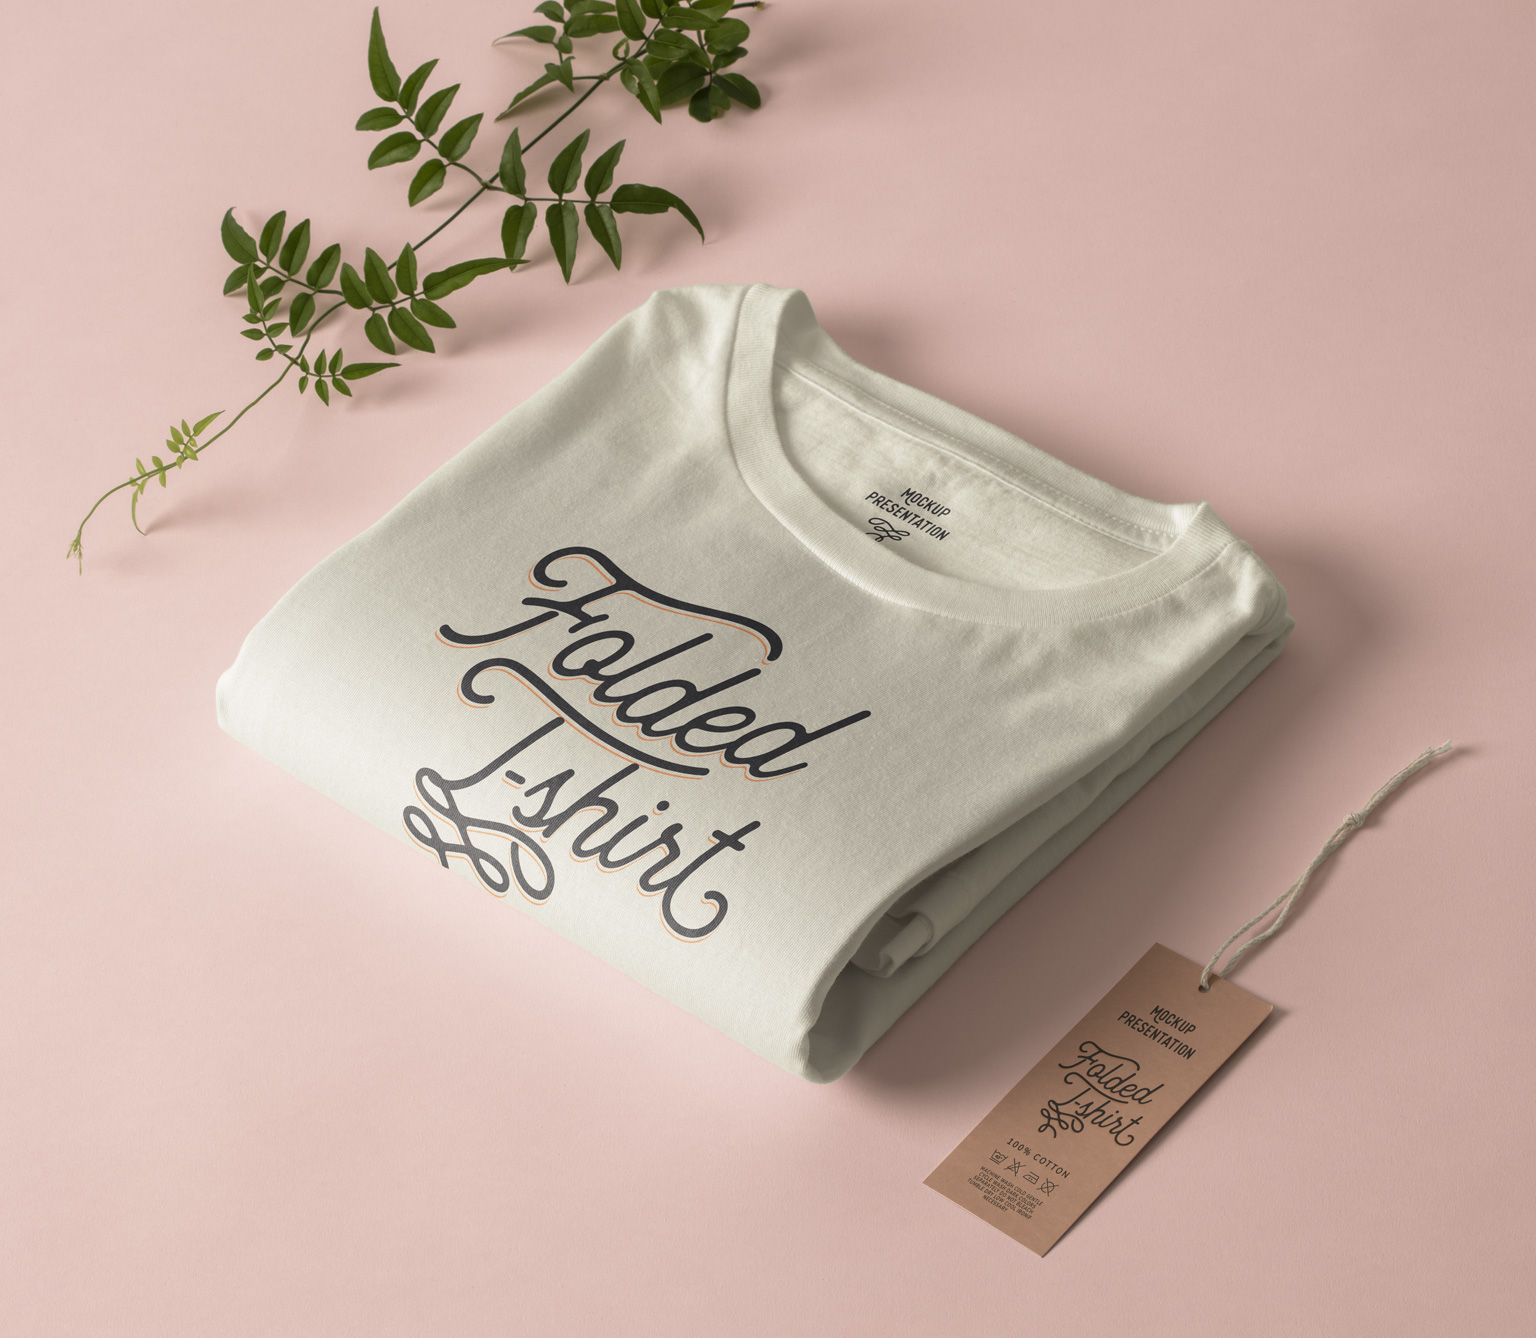 Download Folded Psd T Shirt Mockup Template Psd Mock Up Templates Pixeden Tshirt Mockup Shirt Mockup Shirt Folding